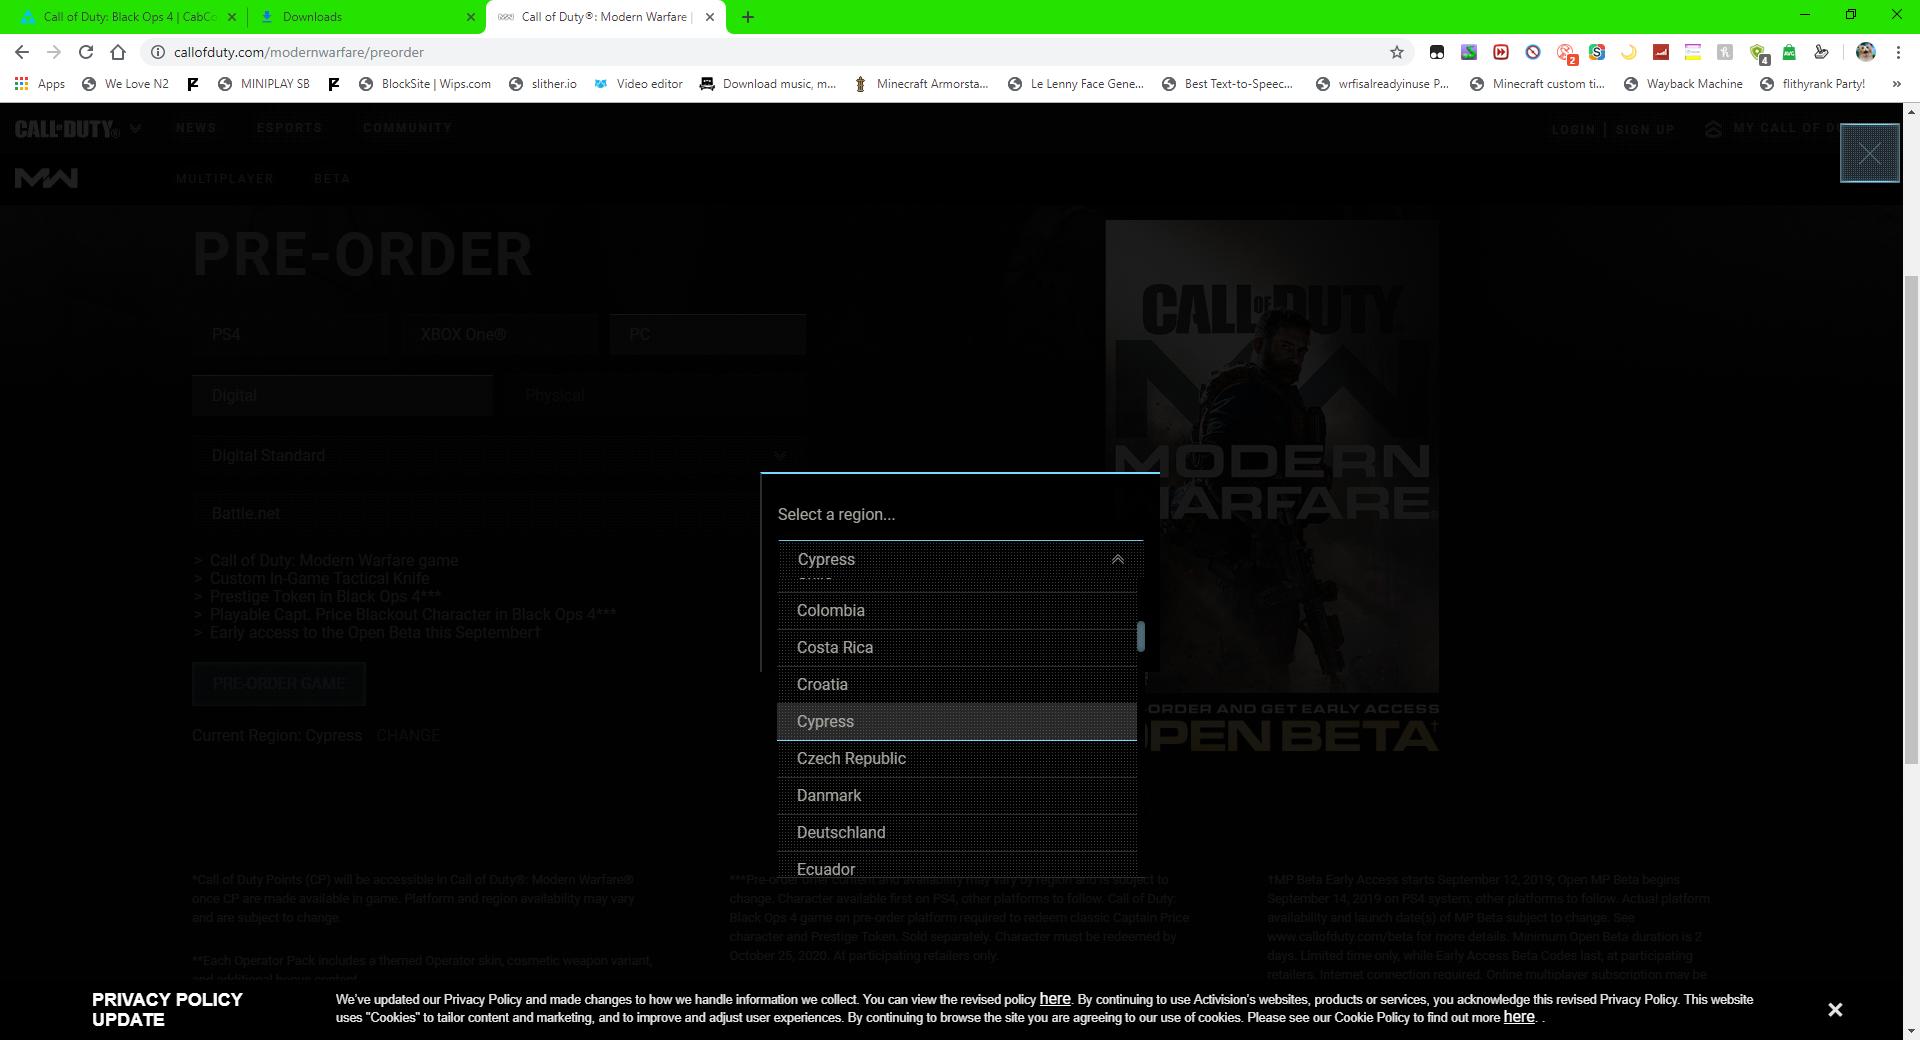 Call of Duty®_ Modern Warfare _ Preorder - Google Chrome 8_10_2019 6_15_56 PM.png